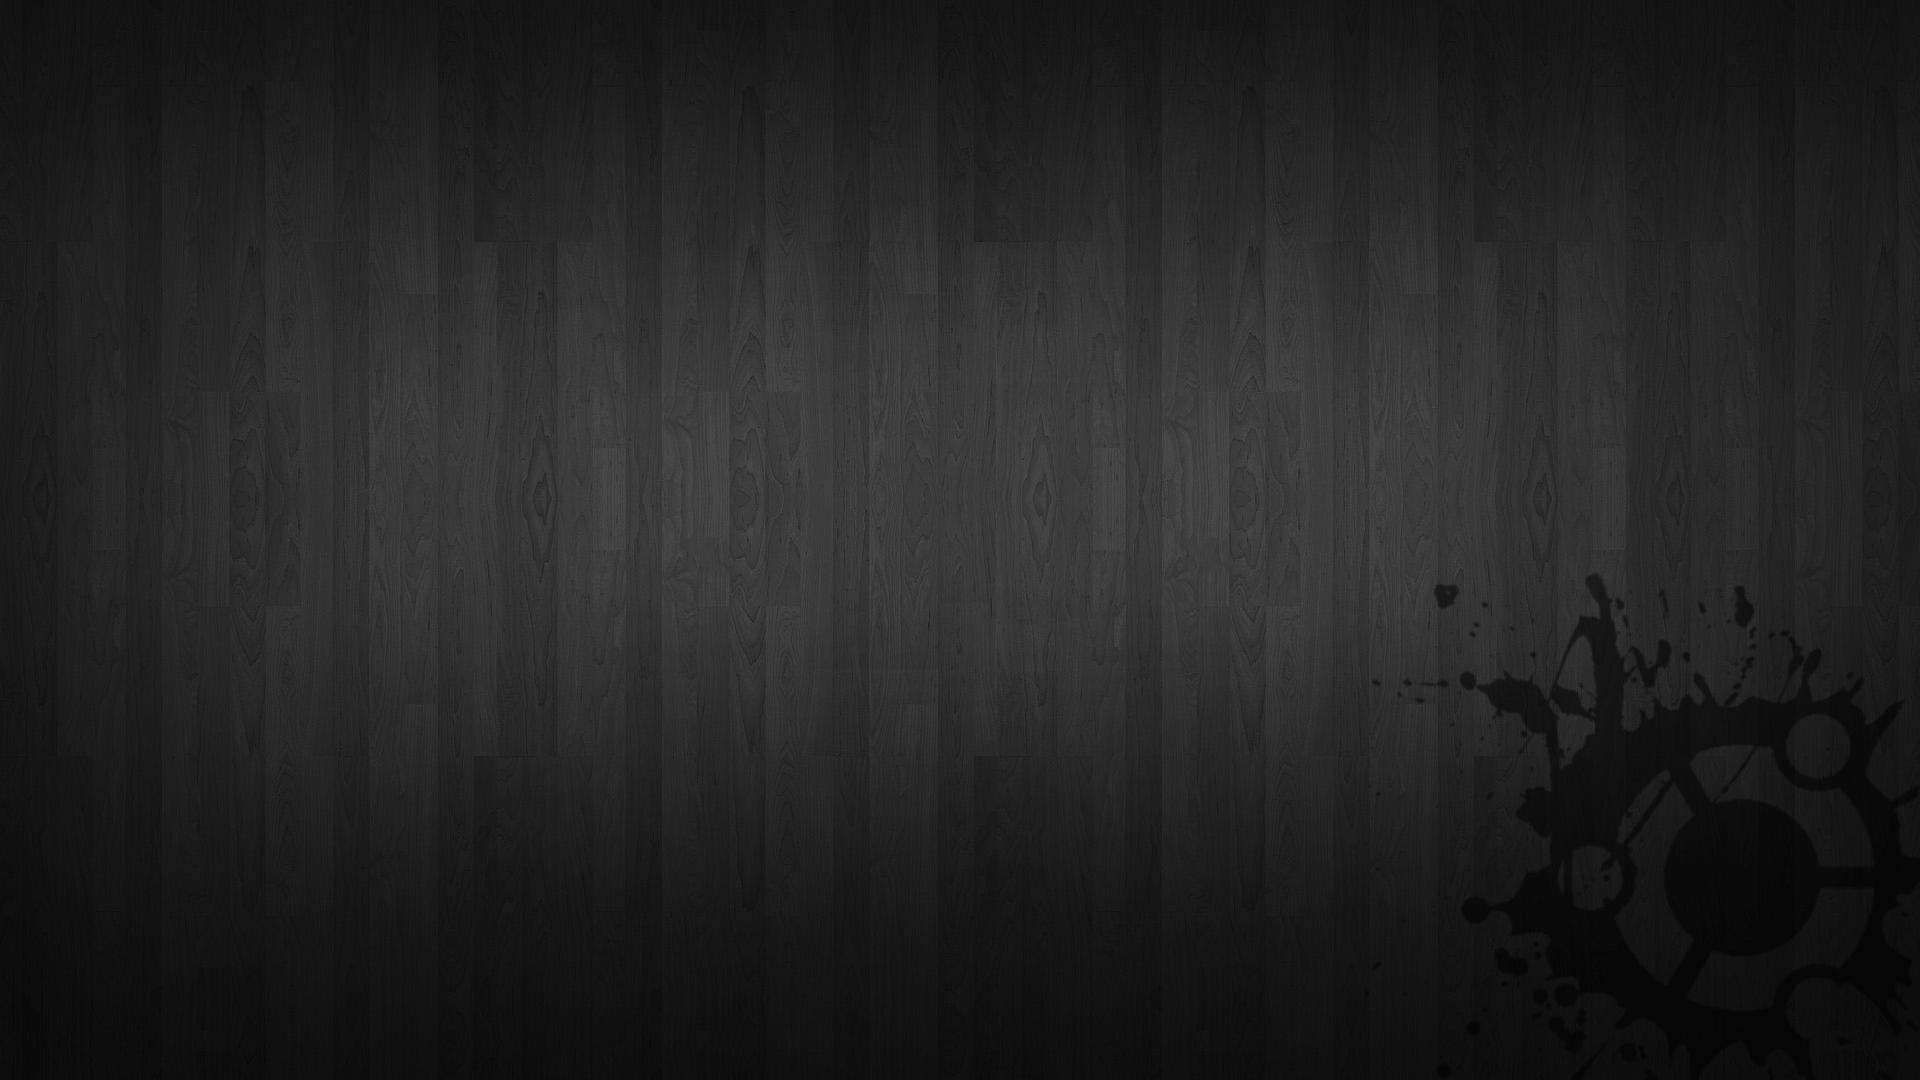 Задний фон темный